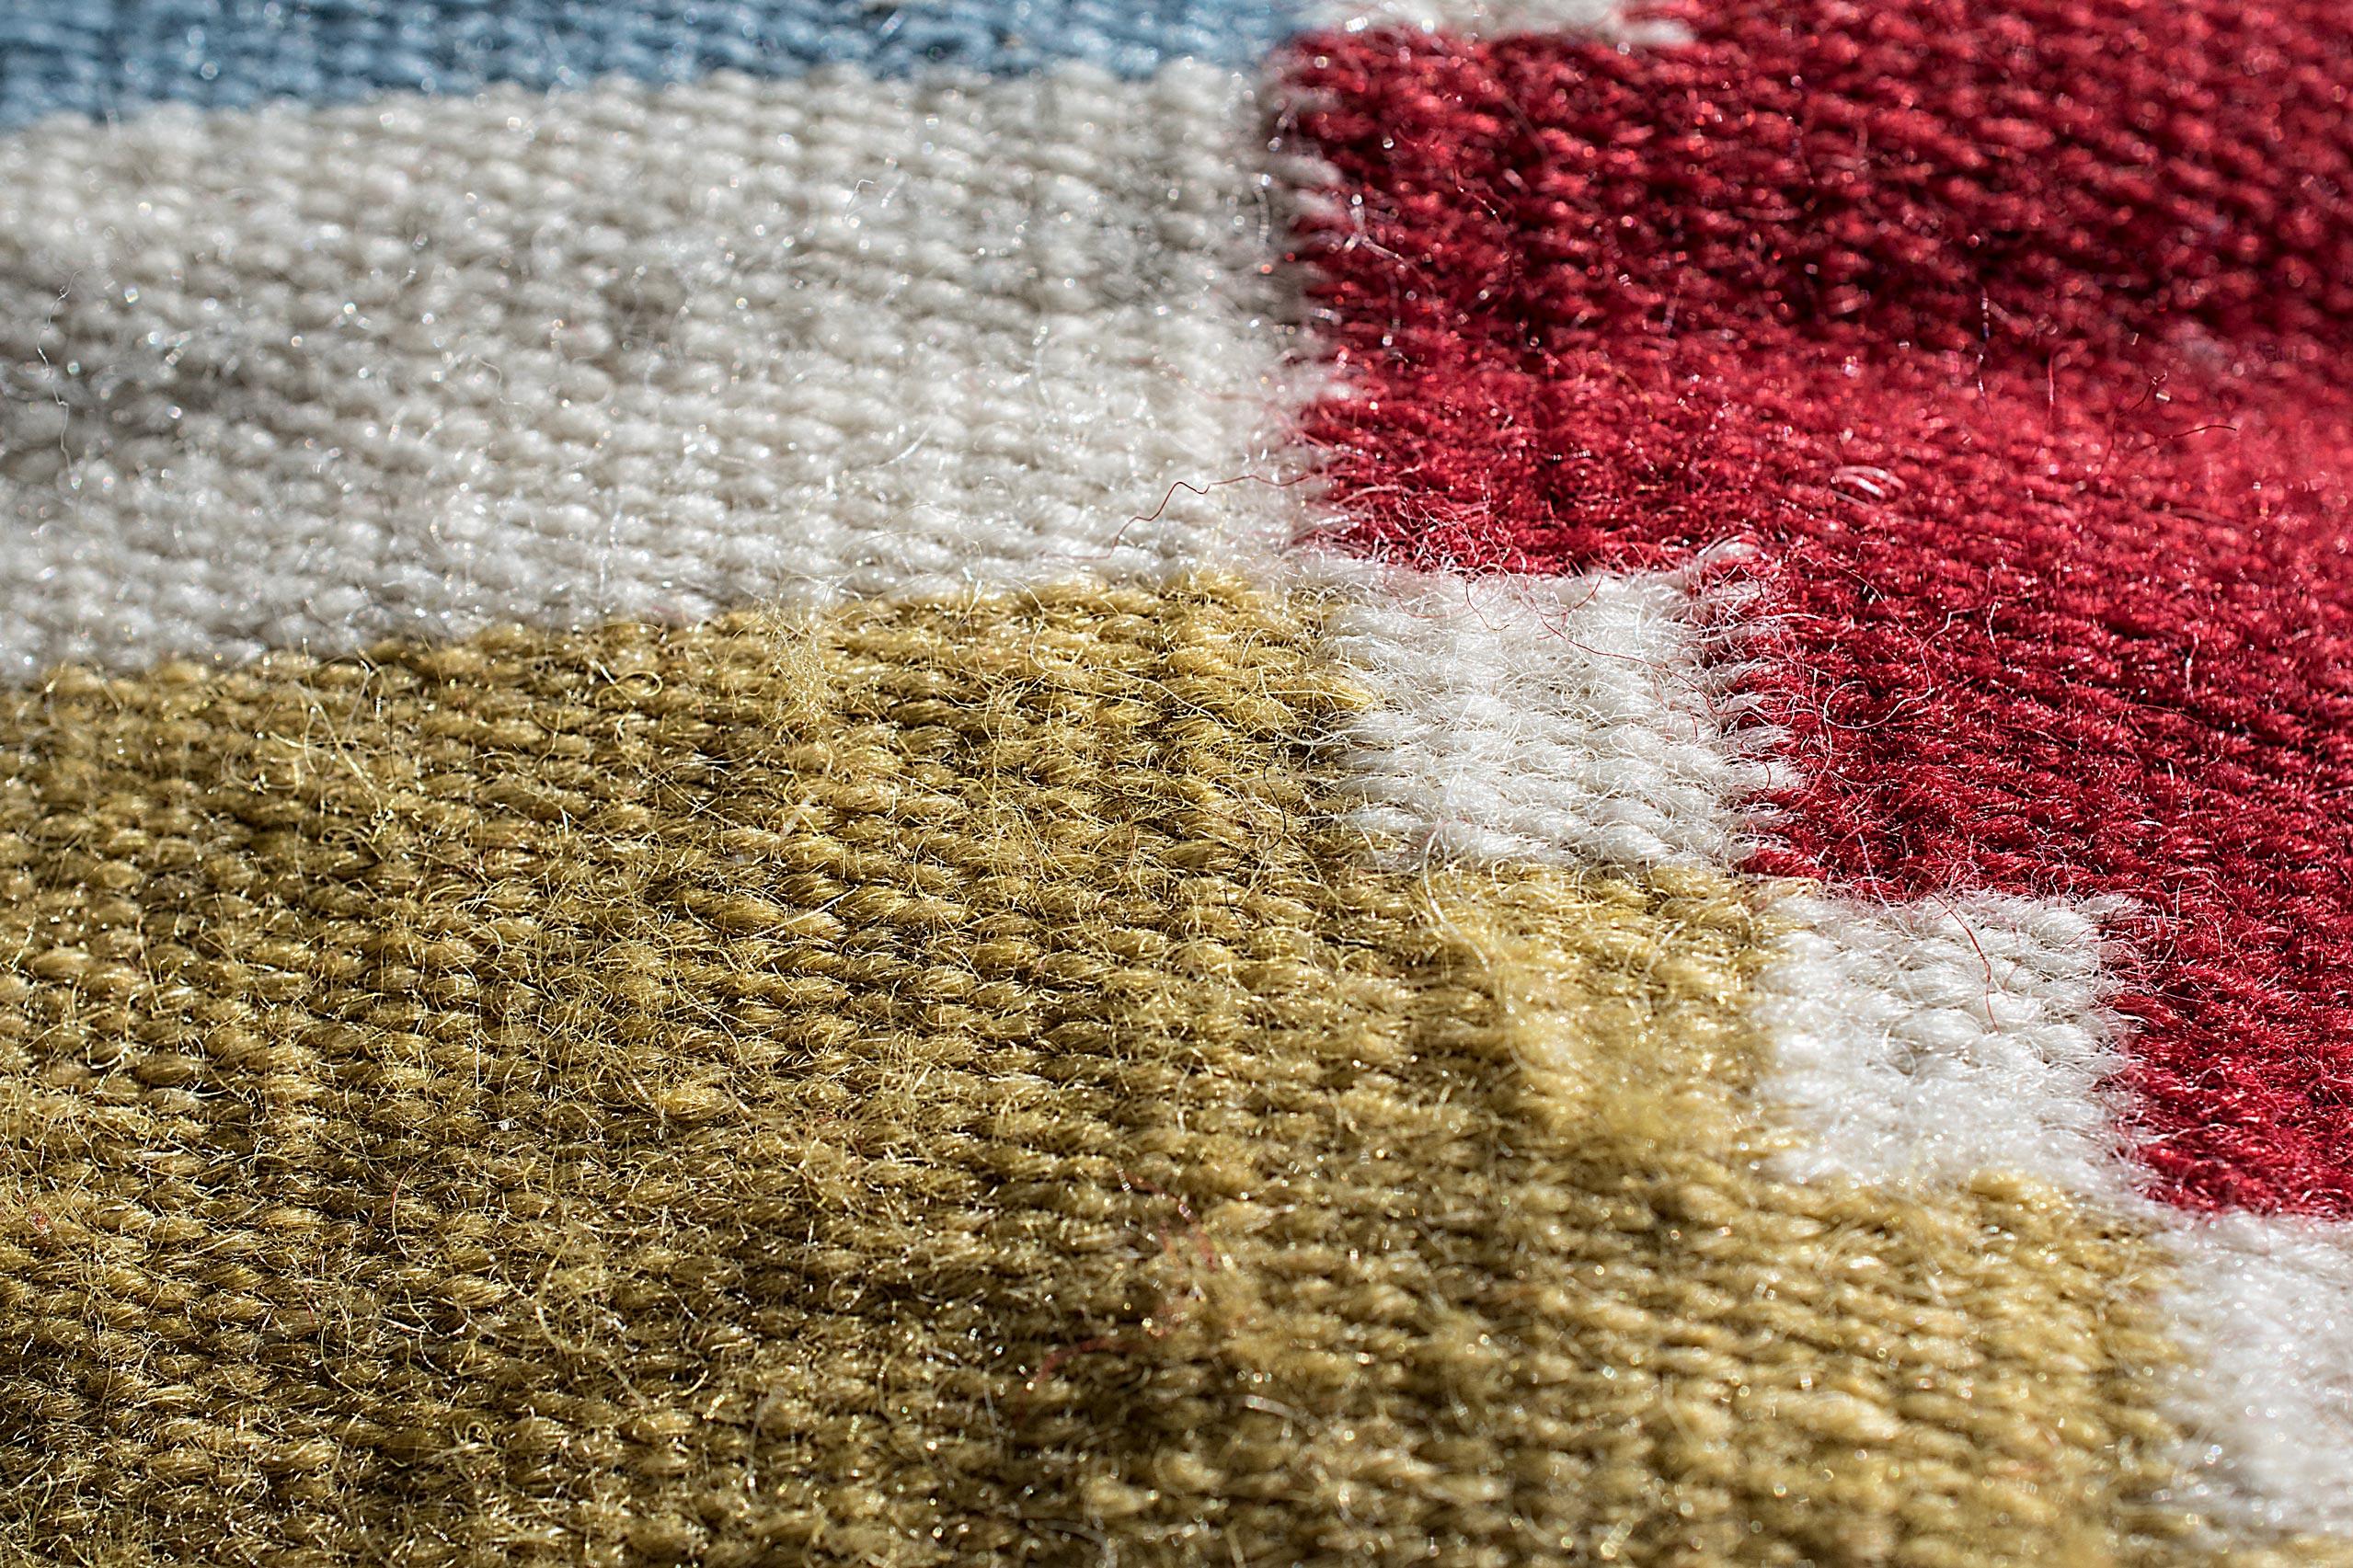 Hintergrundbilder Bunt Weiss Sand Rot Gras Makro Textur Gold